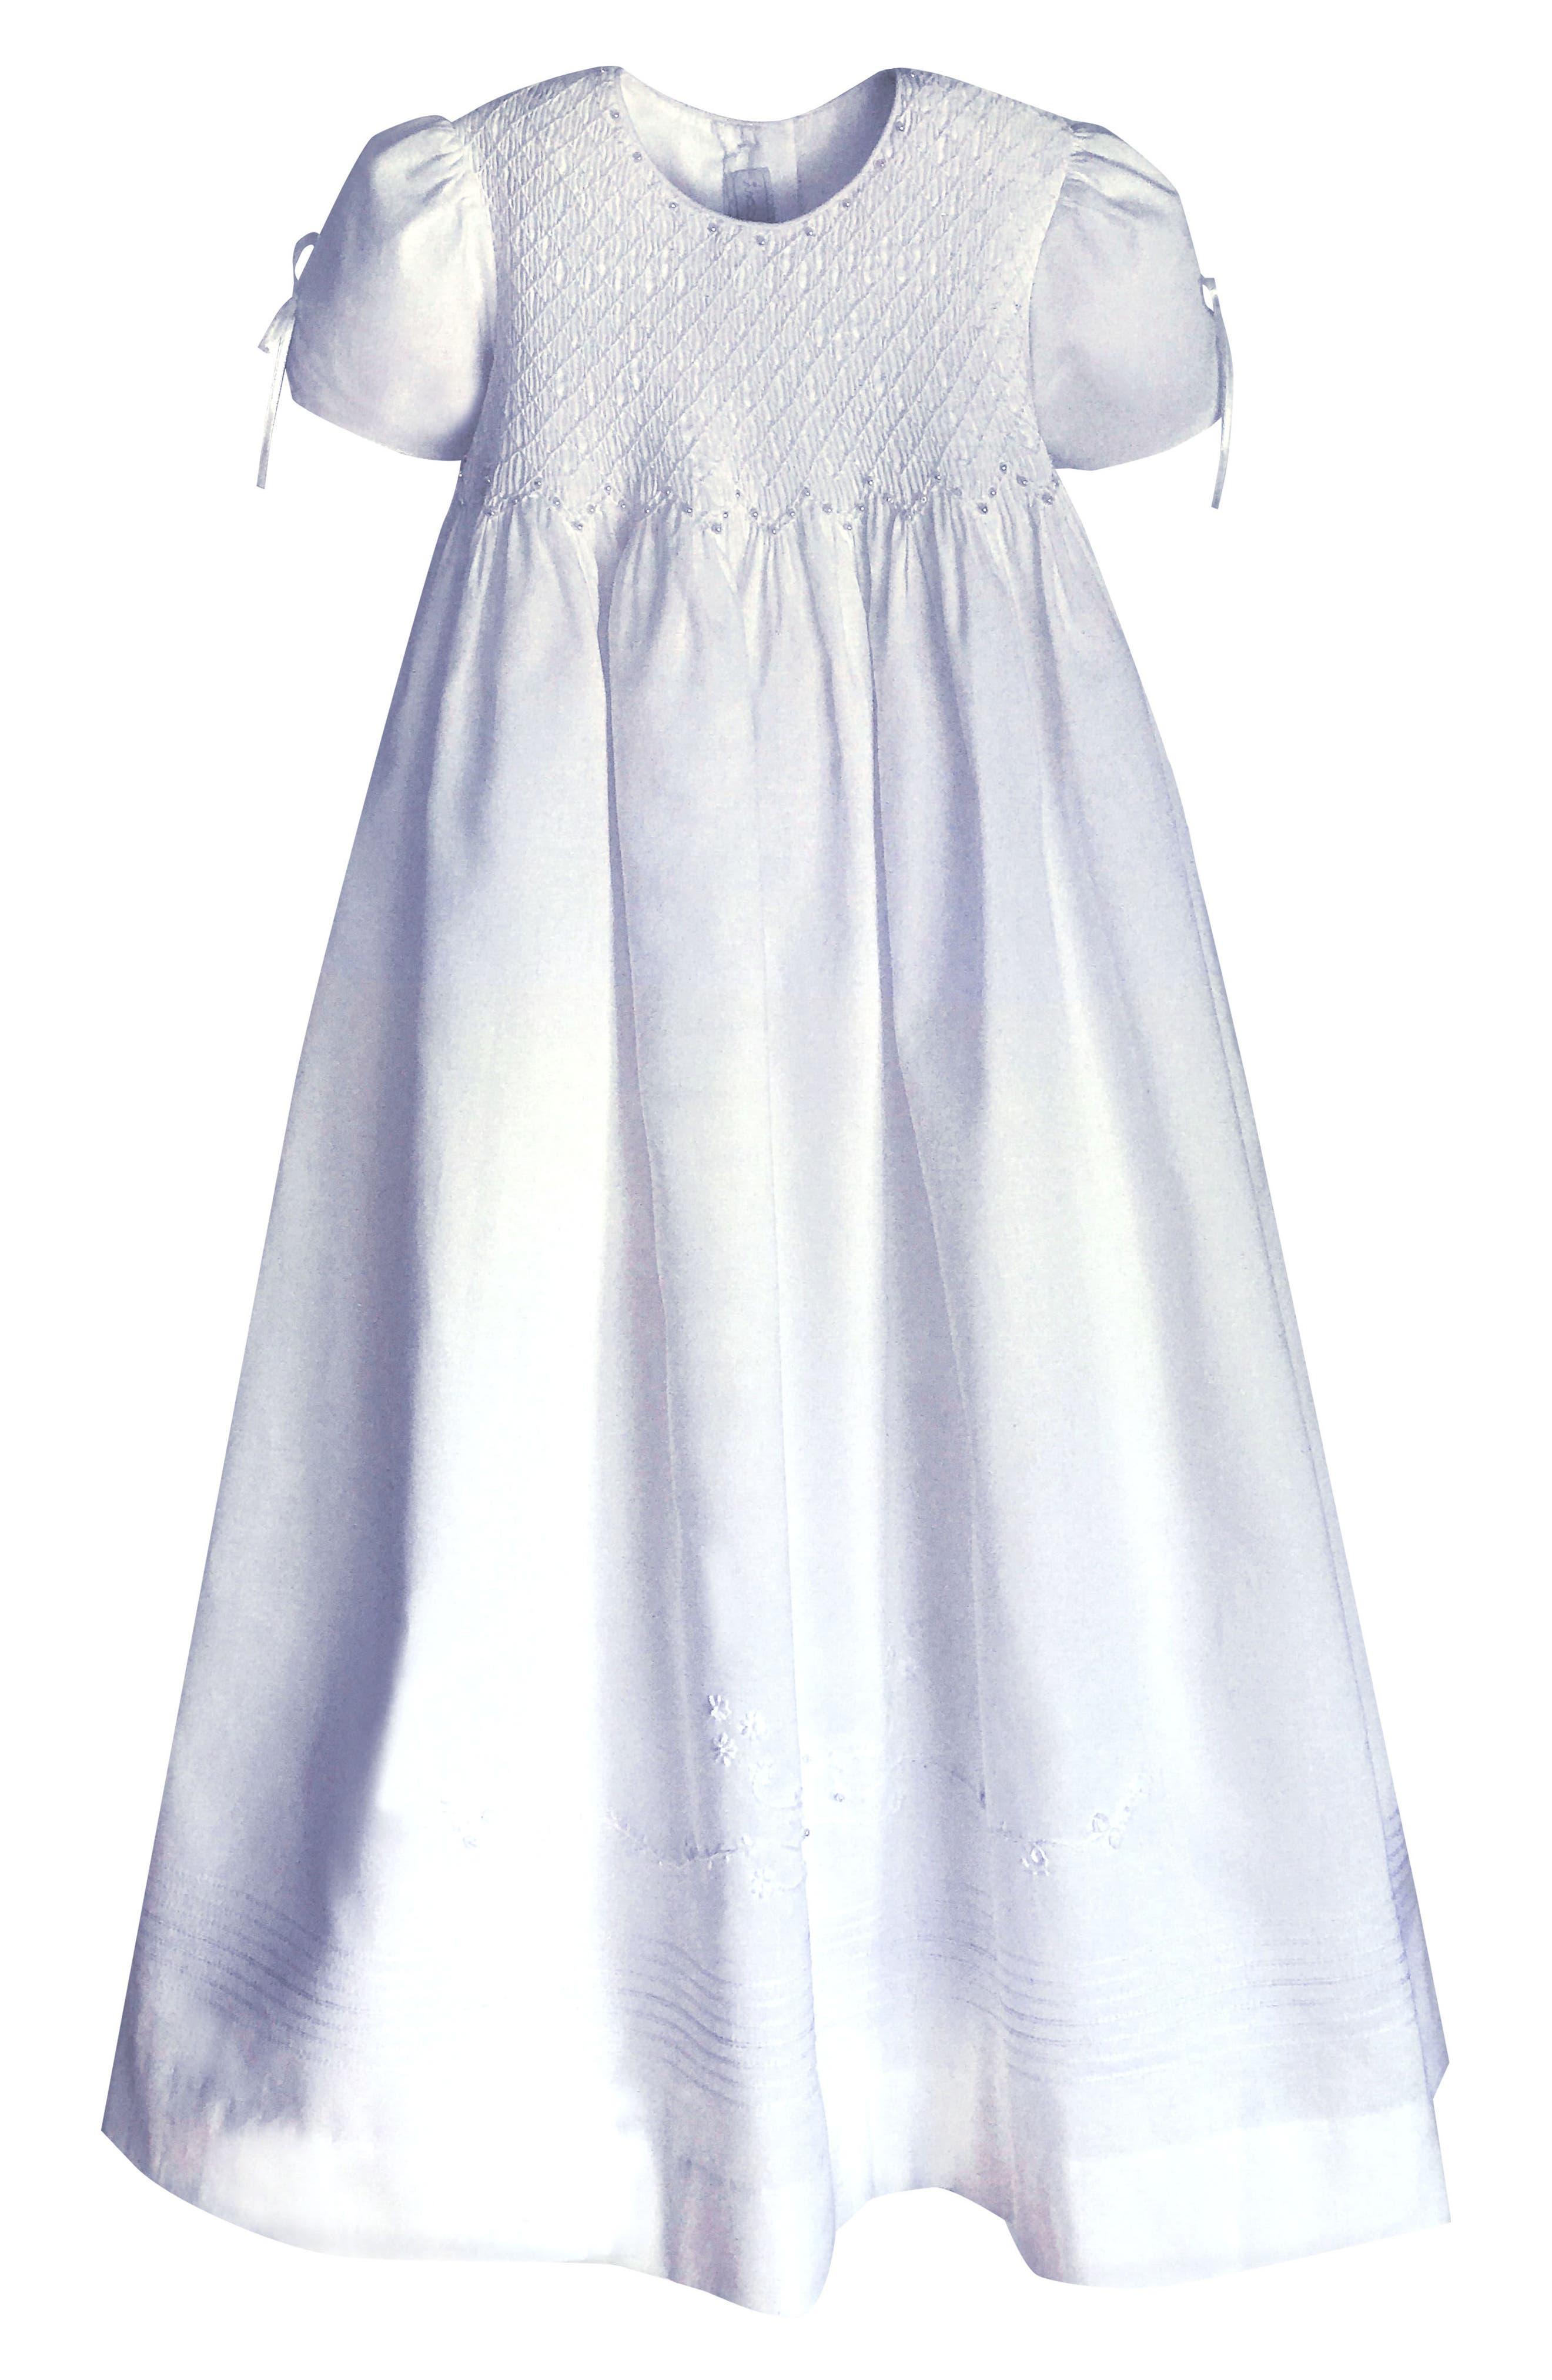 Alternate Image 2  - Isabel Garreton 'Pearls' Christening Gown & Bonnet (Baby)